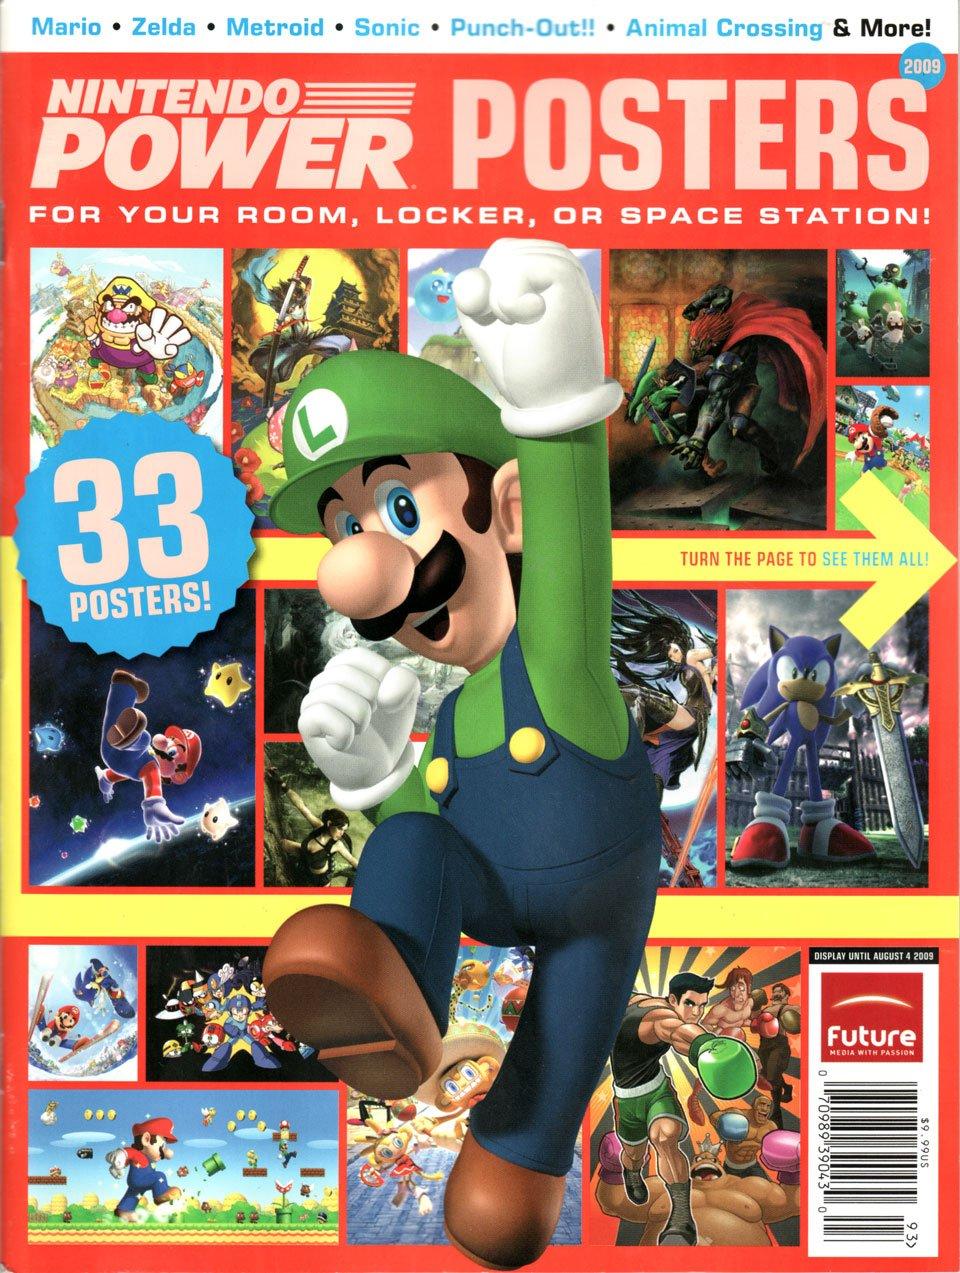 Nintendo Power Posters 2009